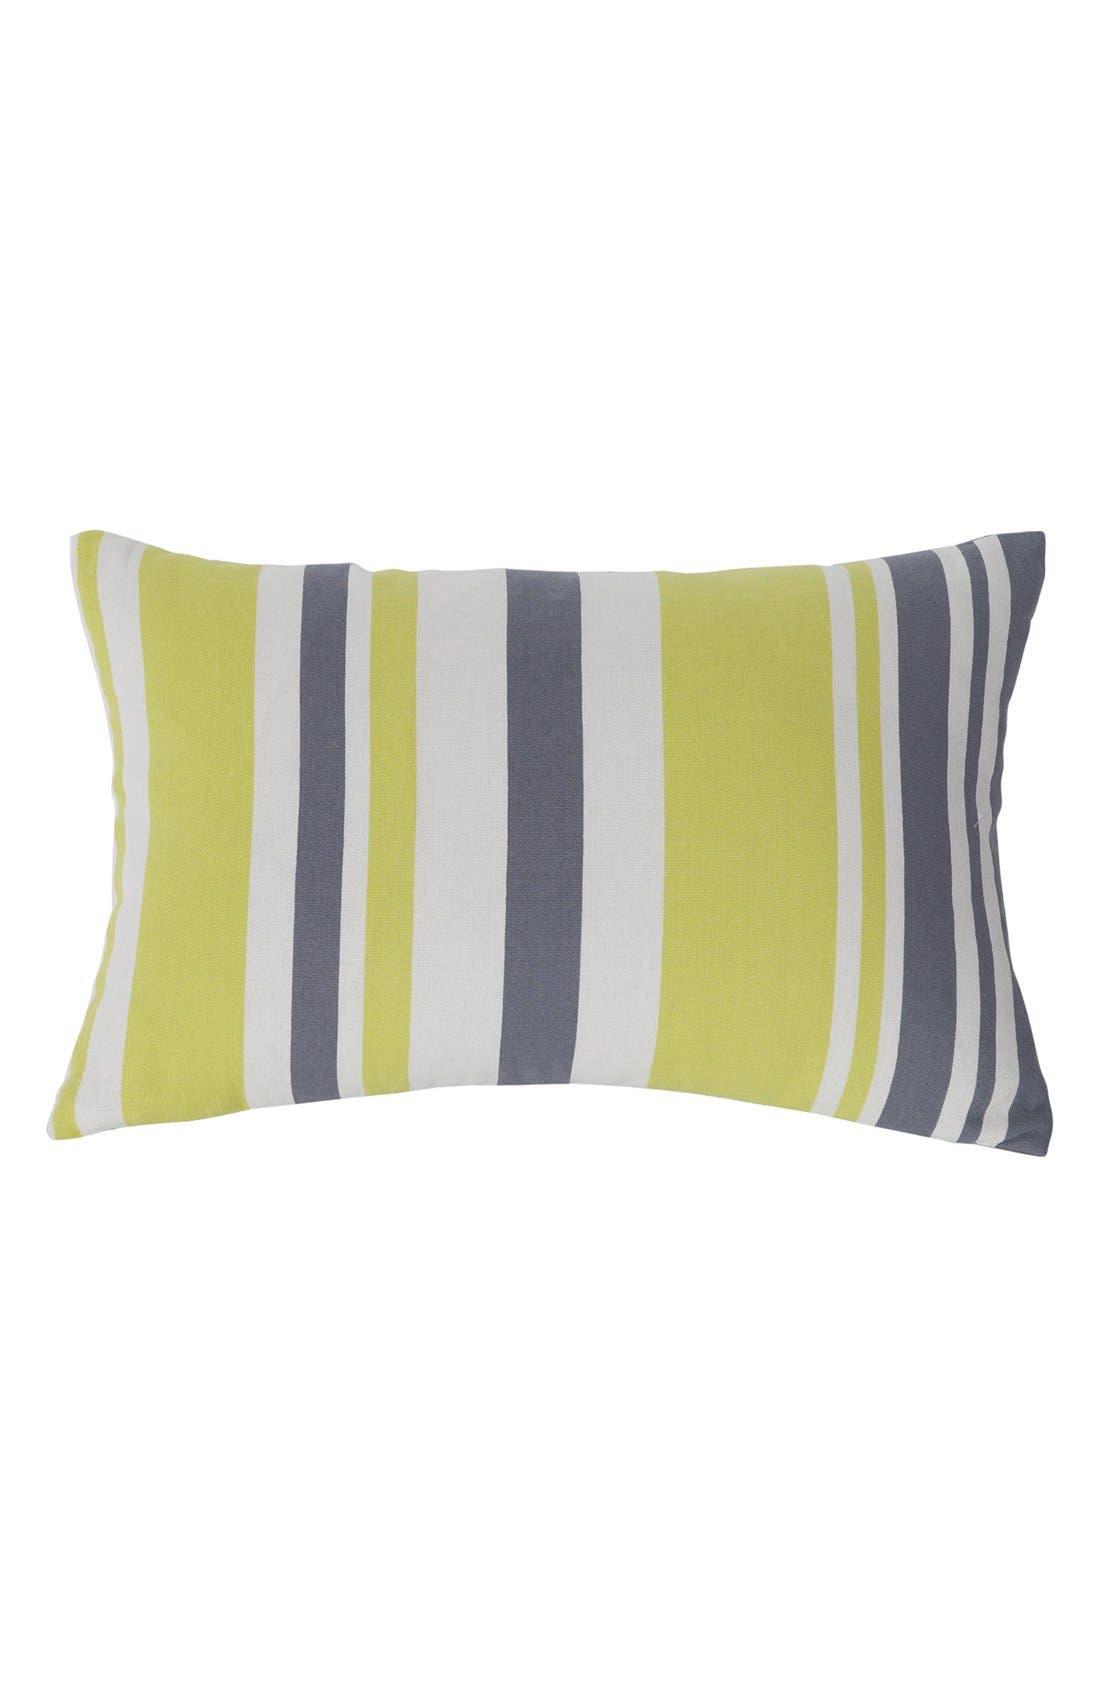 'Etta' Pillow,                             Main thumbnail 1, color,                             Grey/ Citrus